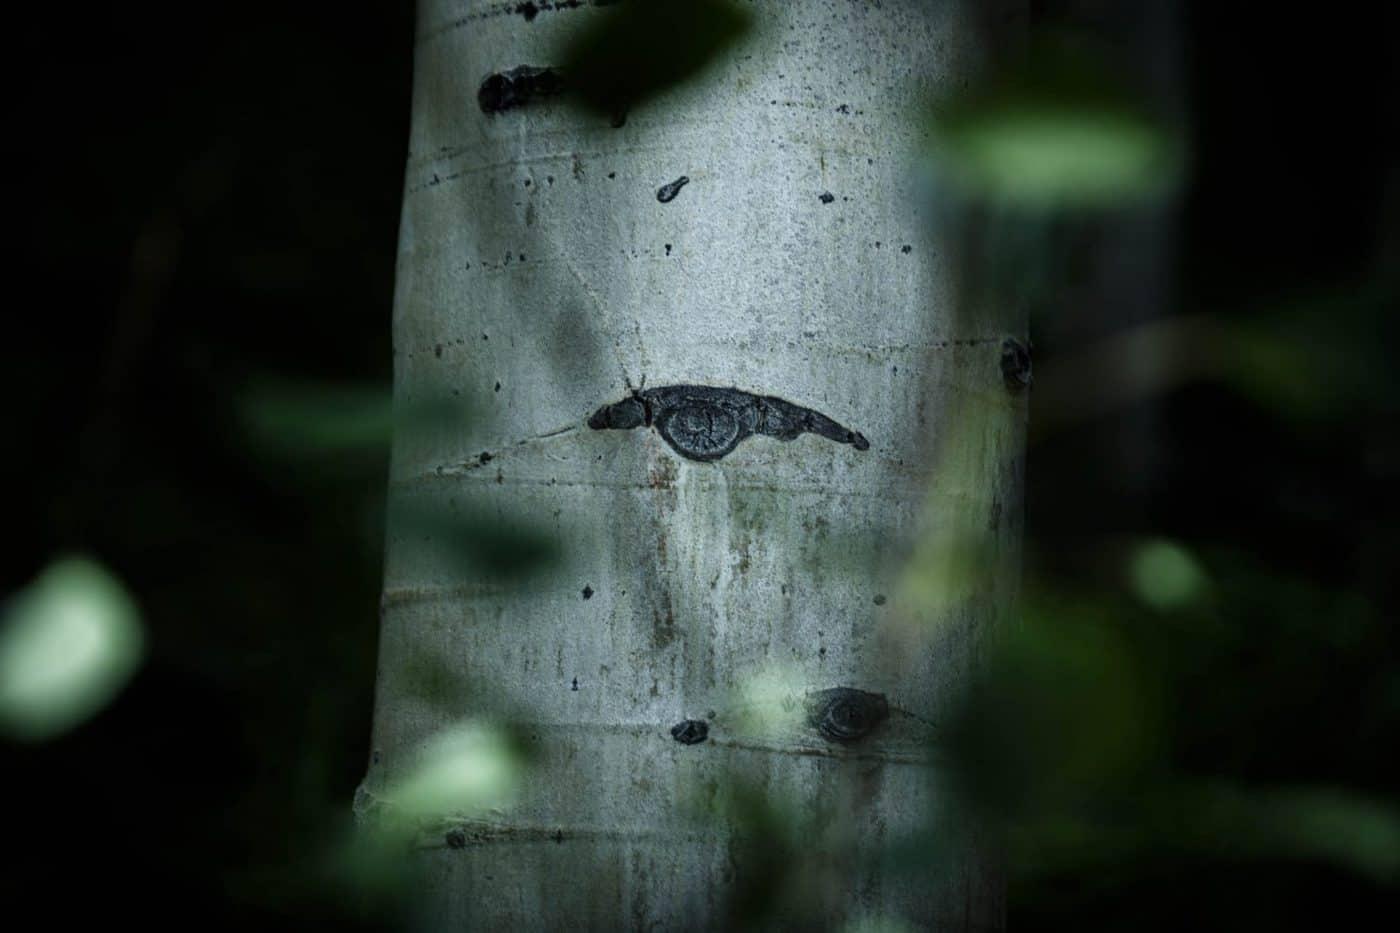 Retrato de un arbol / Portrait of a tree. Wimblu